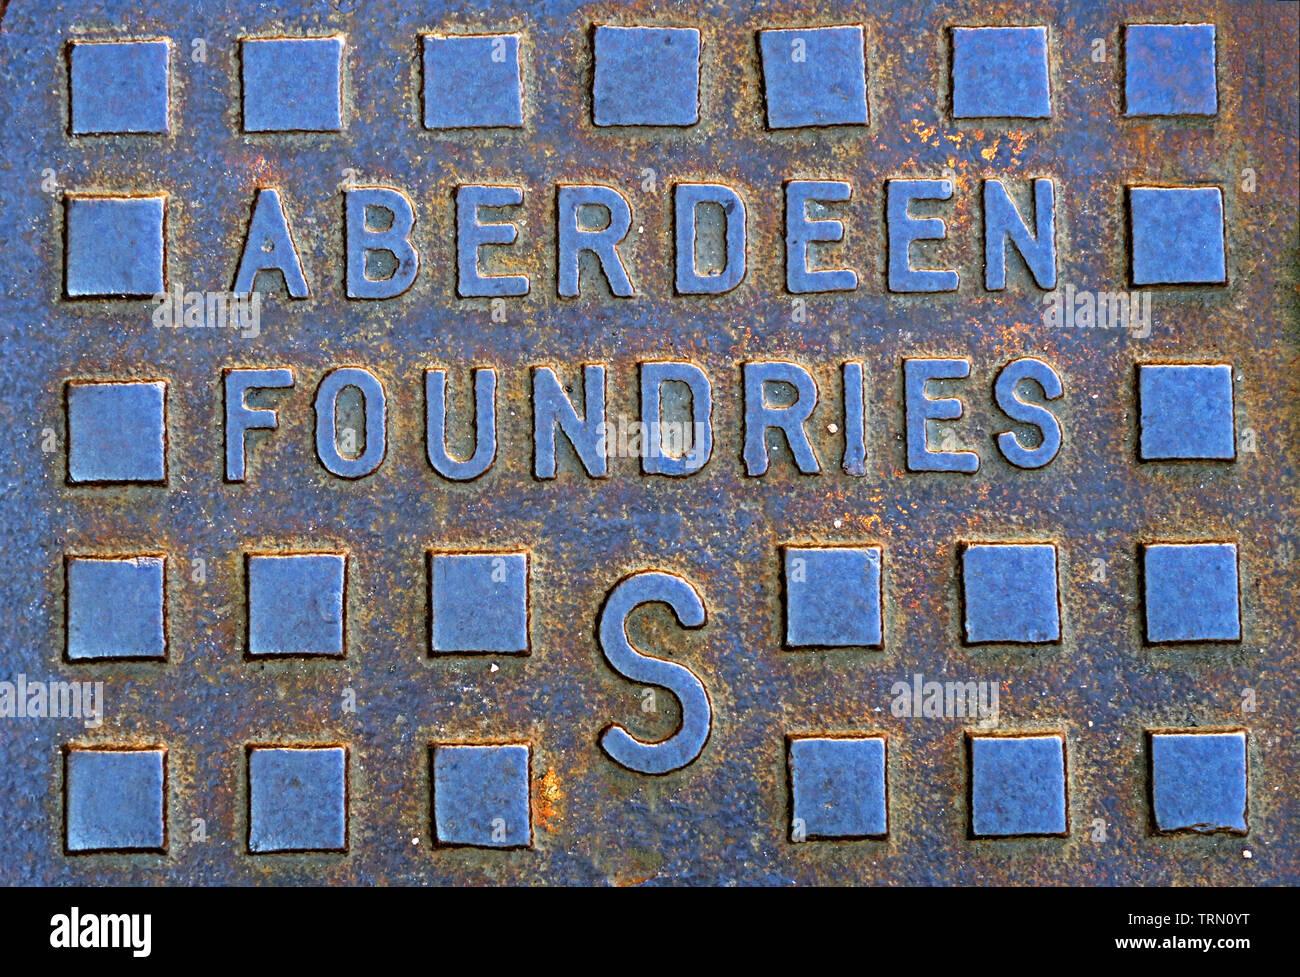 Aberdeen Foundaries Cast Iron Manhole Cover, City Centre, Aberdeen , Scotland, UK - Stock Image